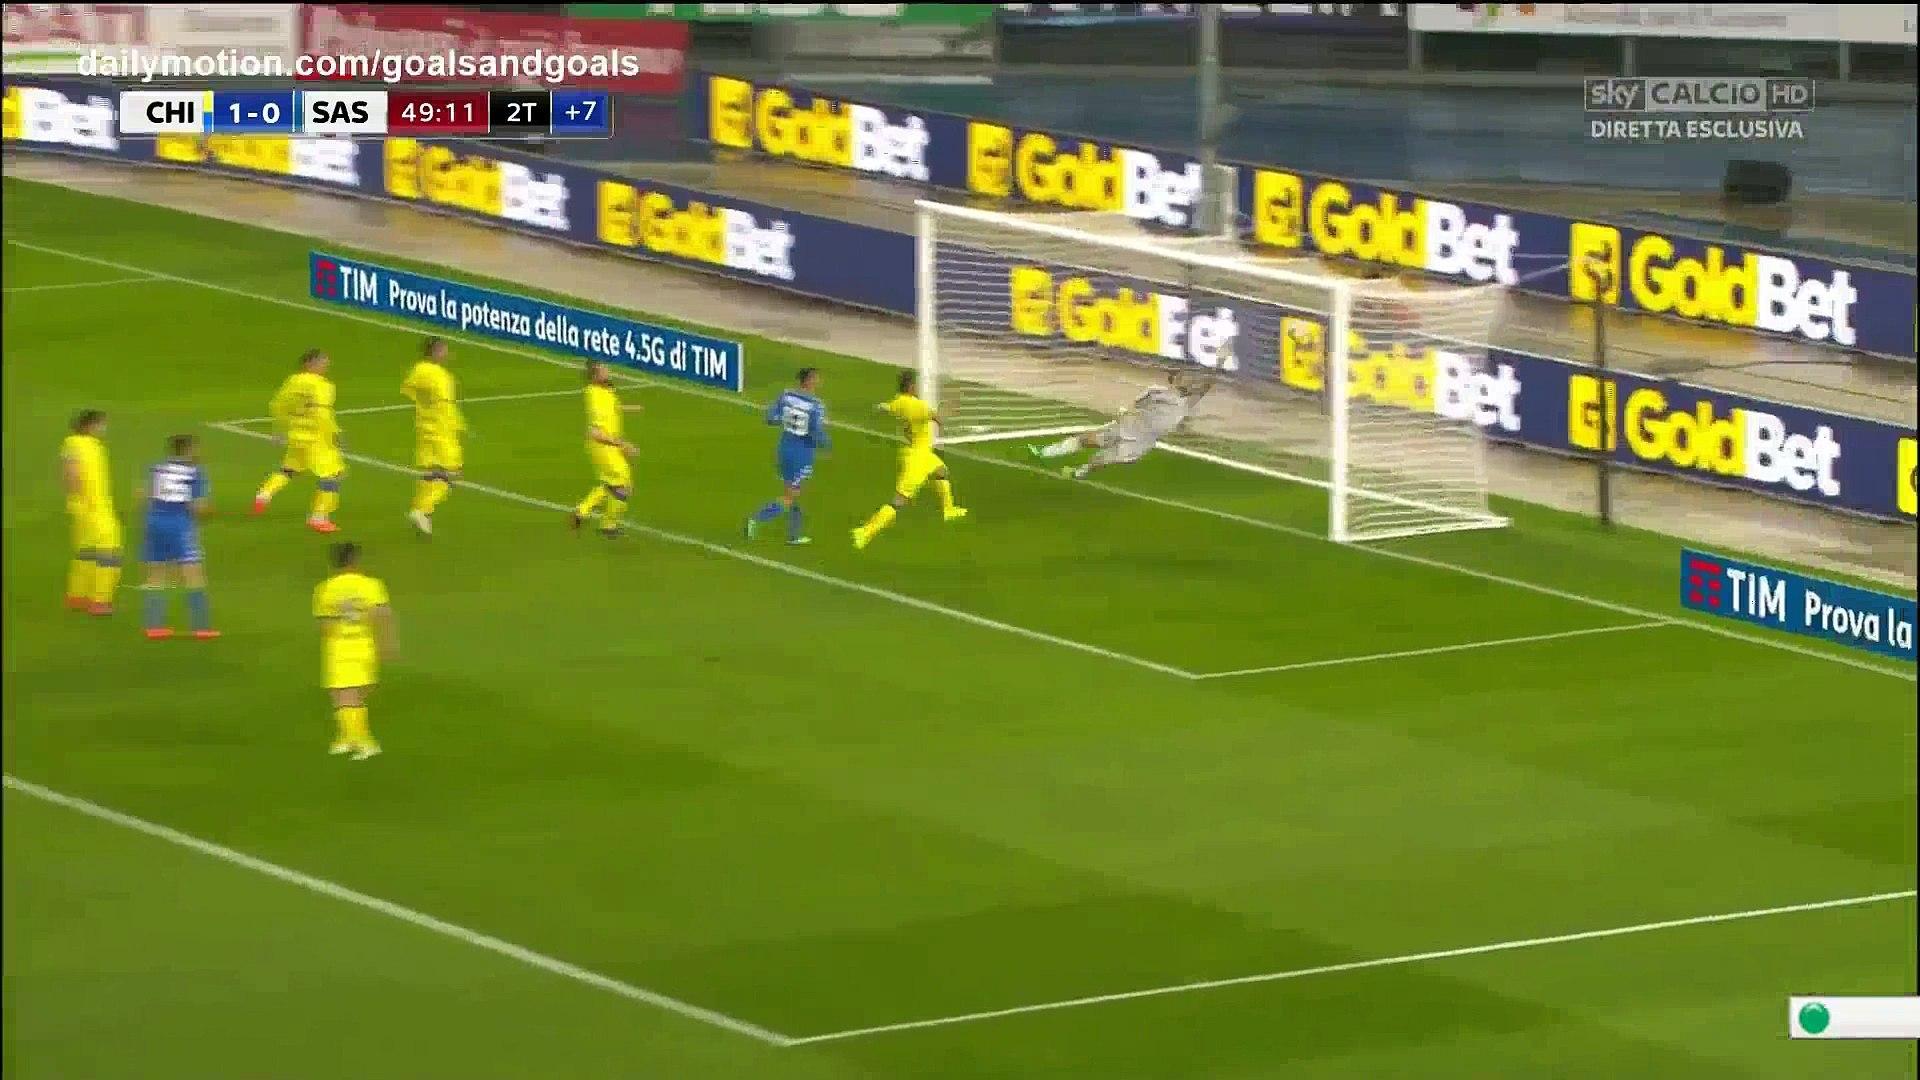 Francesco Cassata Goal Hd Chievo 1 1 Sassuolo 04 04 2018 Full Replay Video Dailymotion